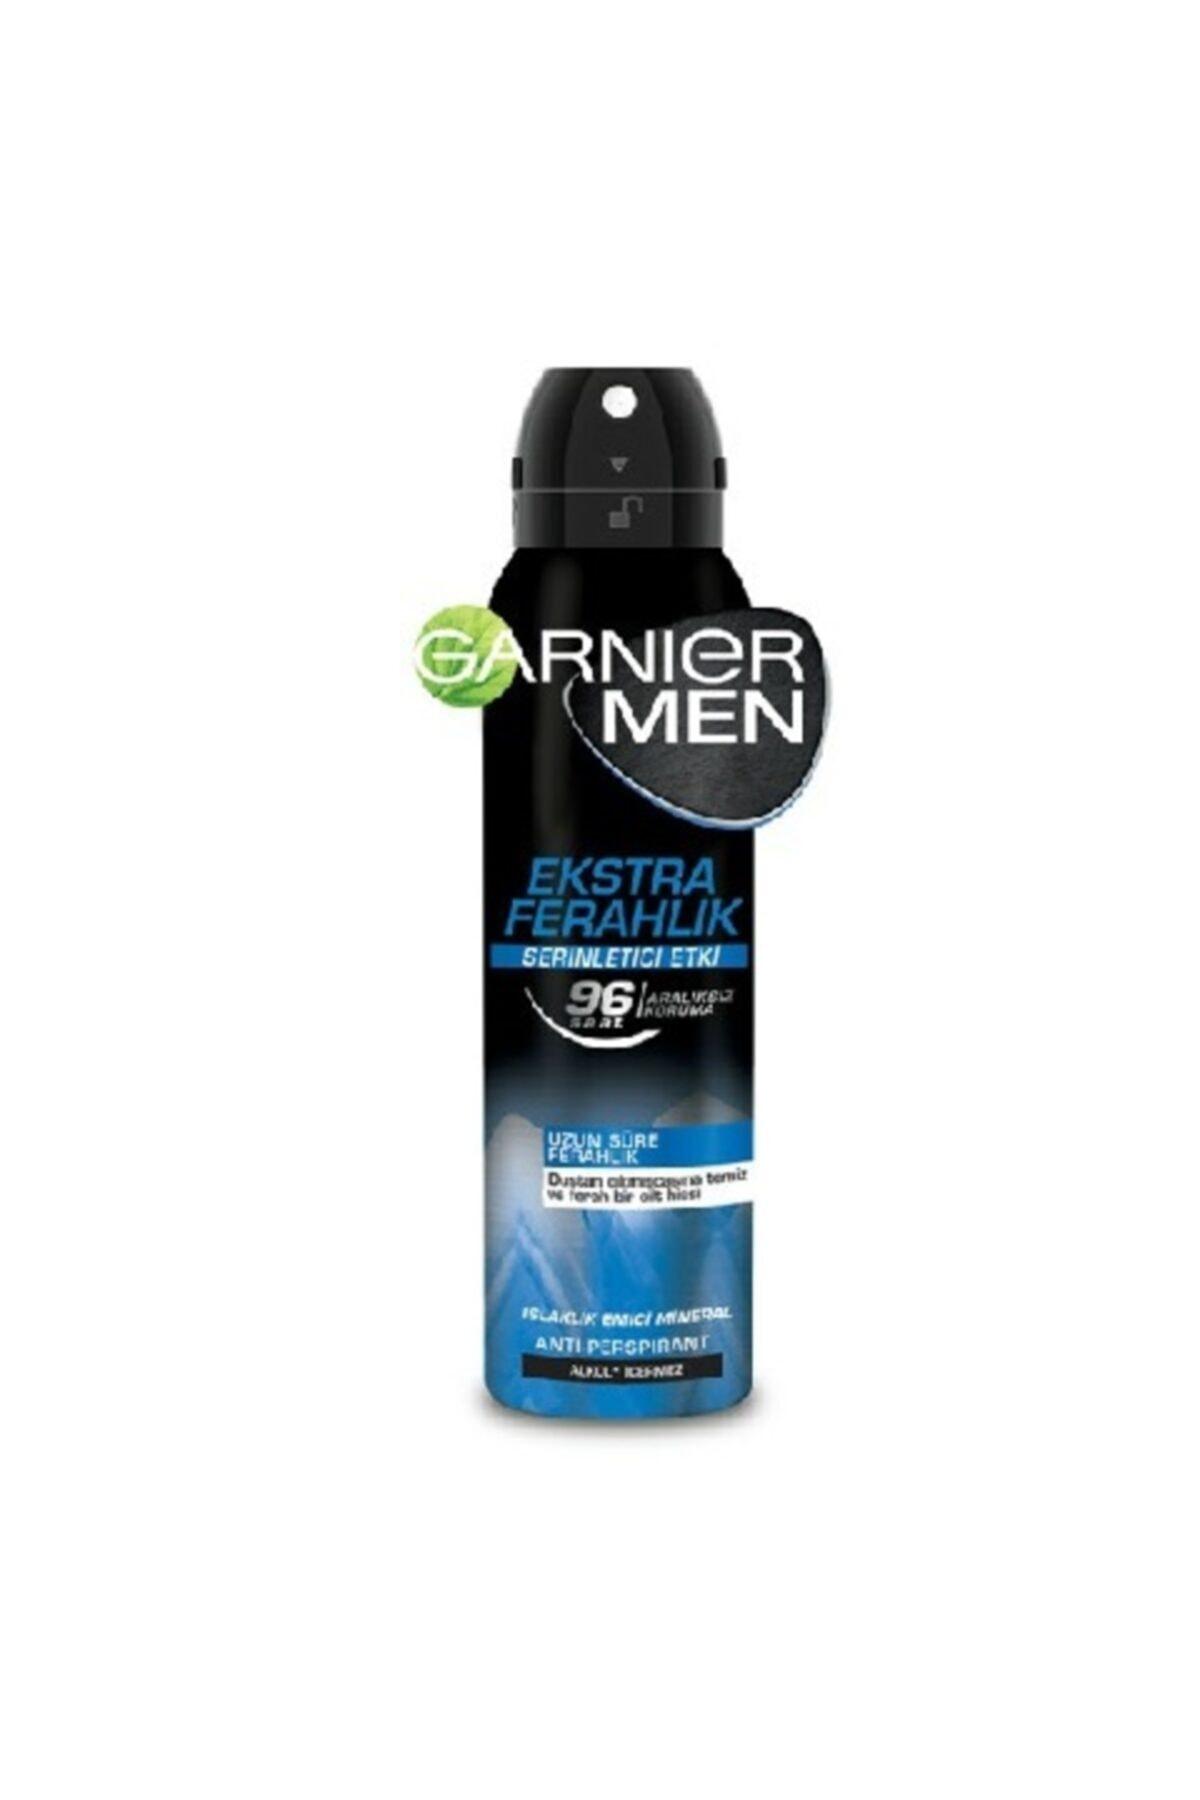 Garnier Men Ekstra Ferahlık Serinletici Etki Deodorant 150ml 1